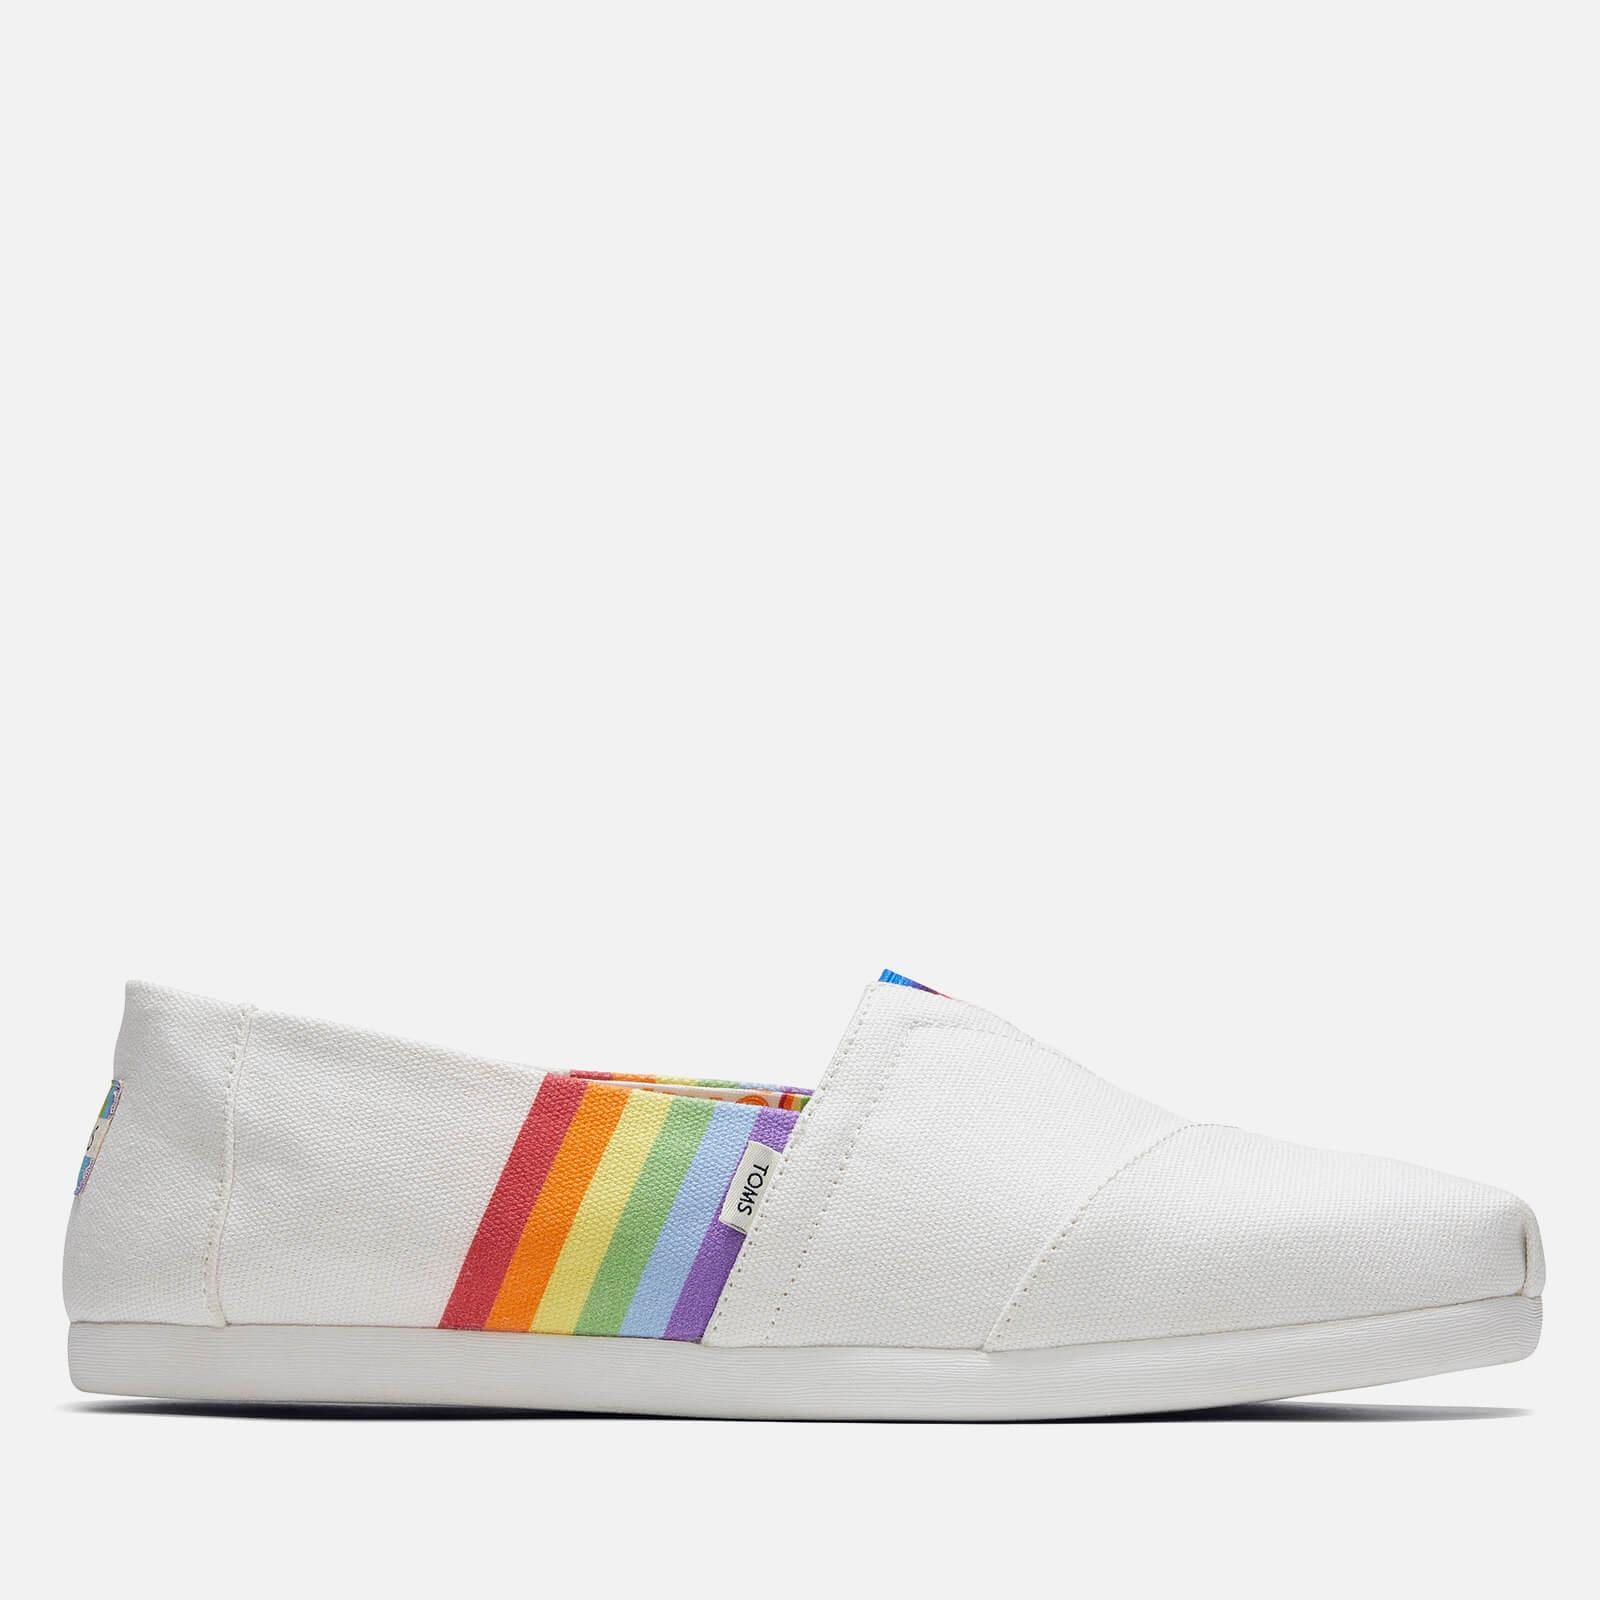 TOMS Men's Alpargata 'Pride Pack' Vegan Pumps - White Unity Rainbow - UK 7